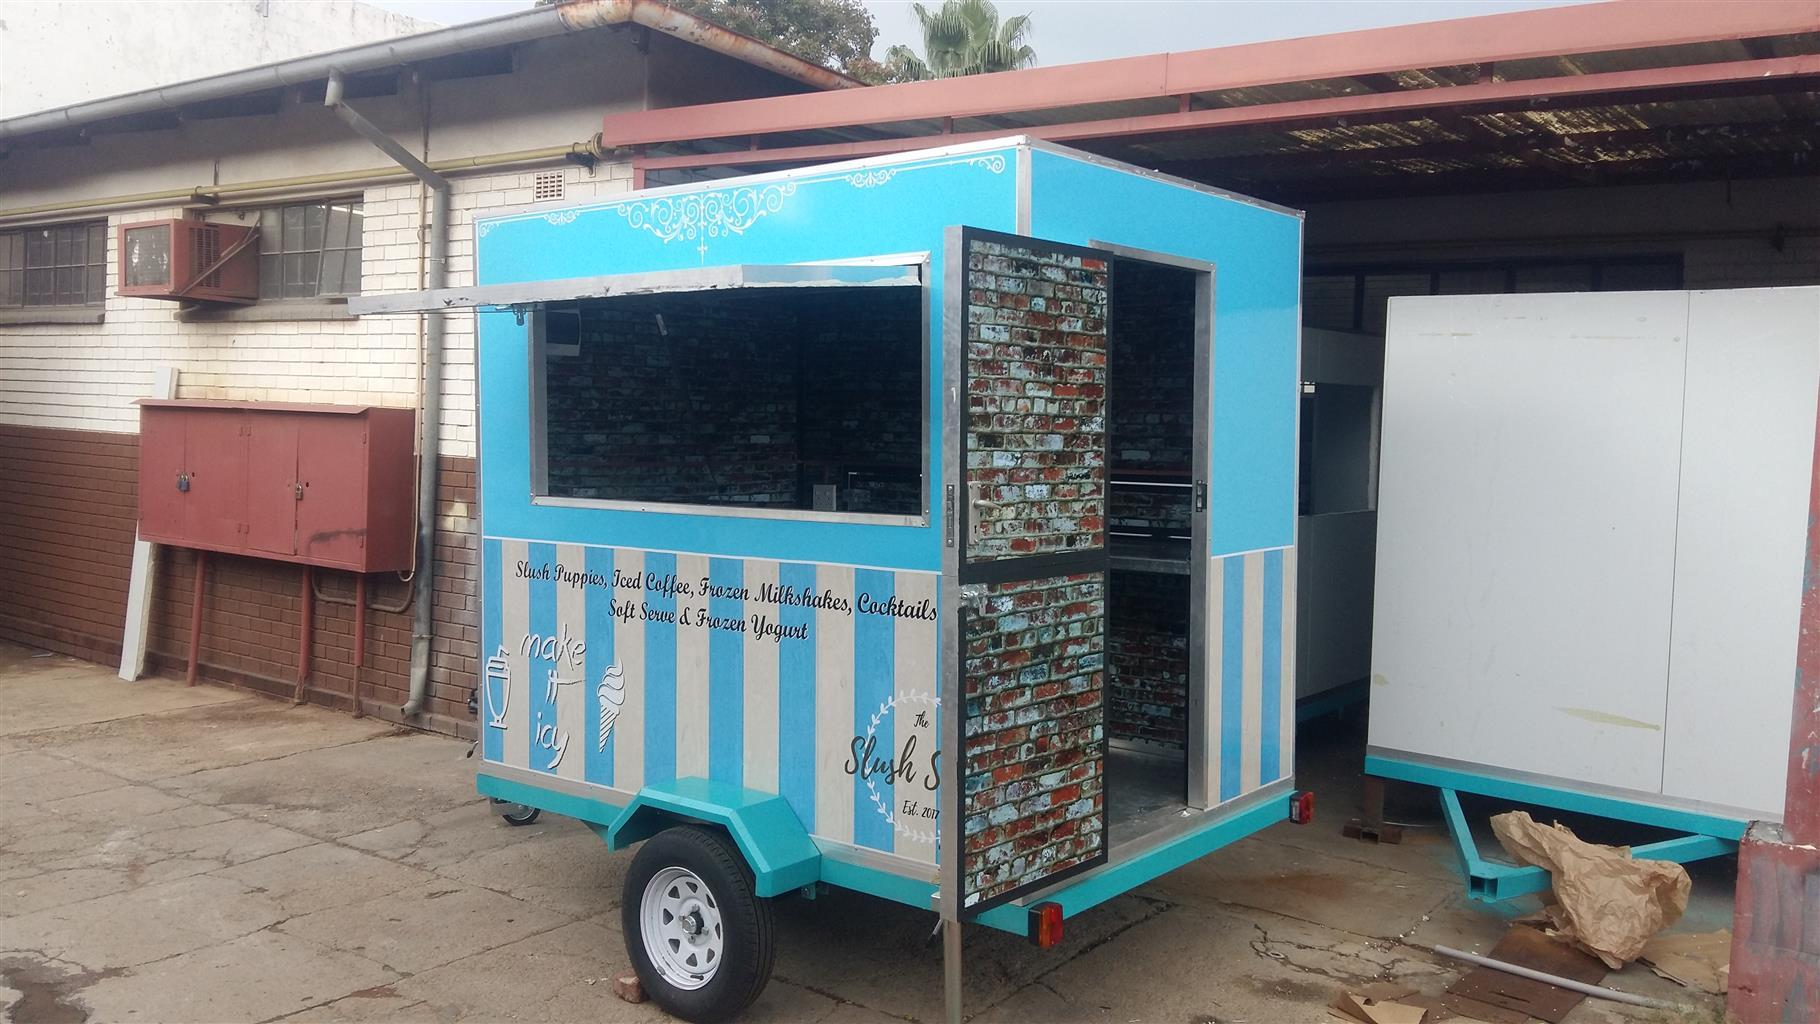 Mobile Kitchen pop up restaurant trailers for sale